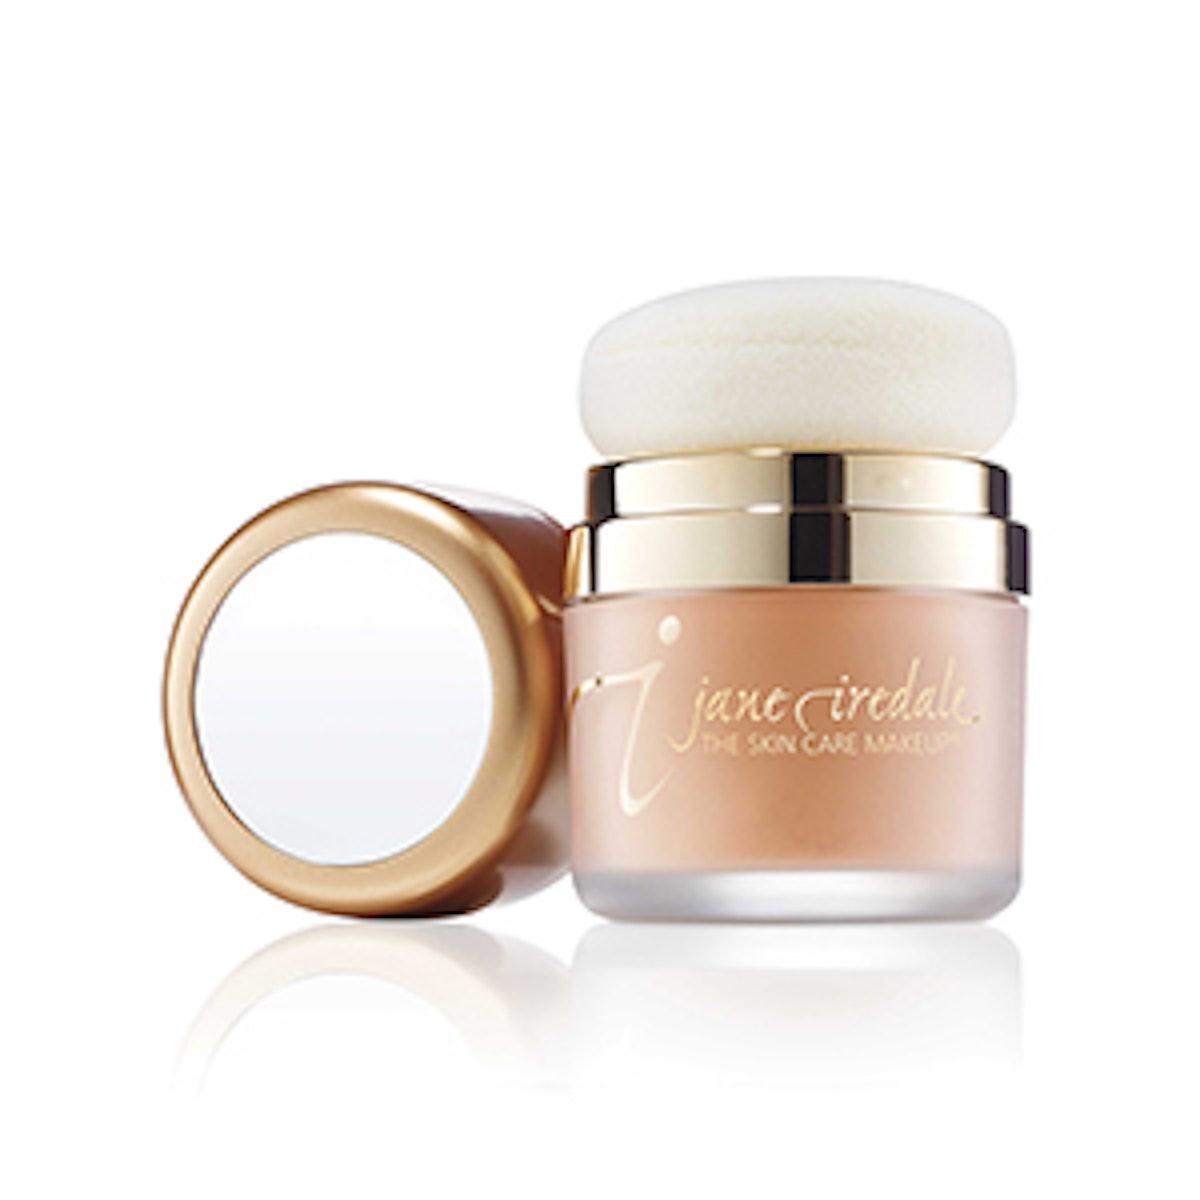 Powder-Me SPF Dry Sunscreen